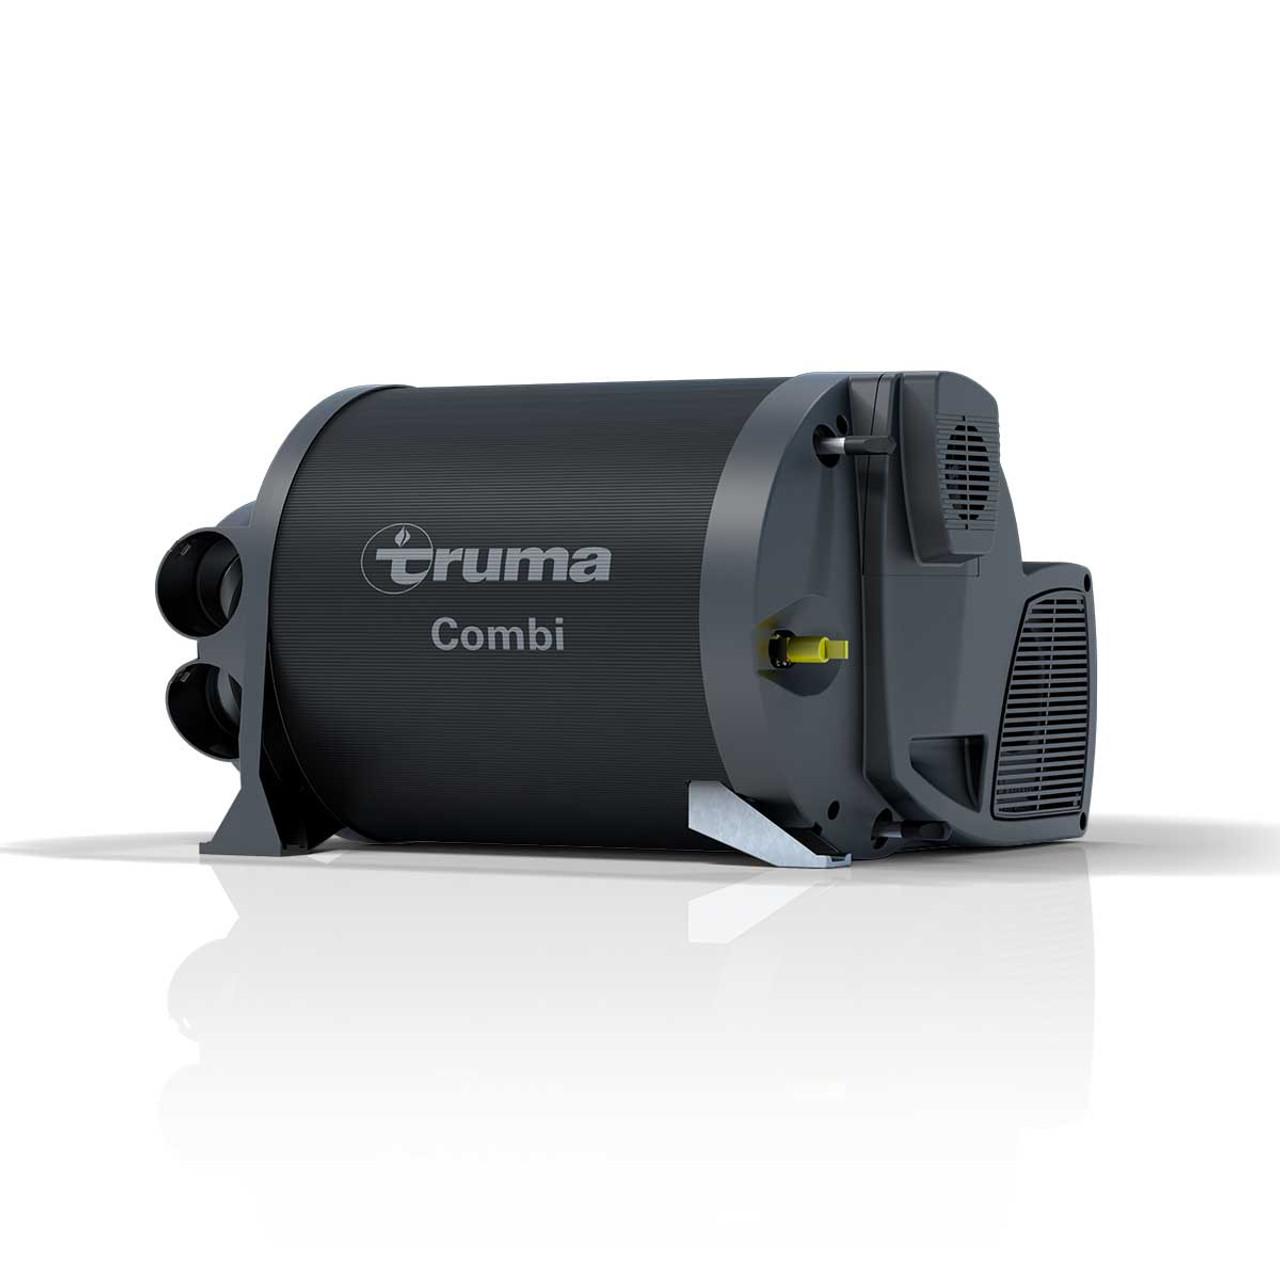 Image of the Truma Combi 4E caravan, motorhome, and campervan space heater and water boiler unit.